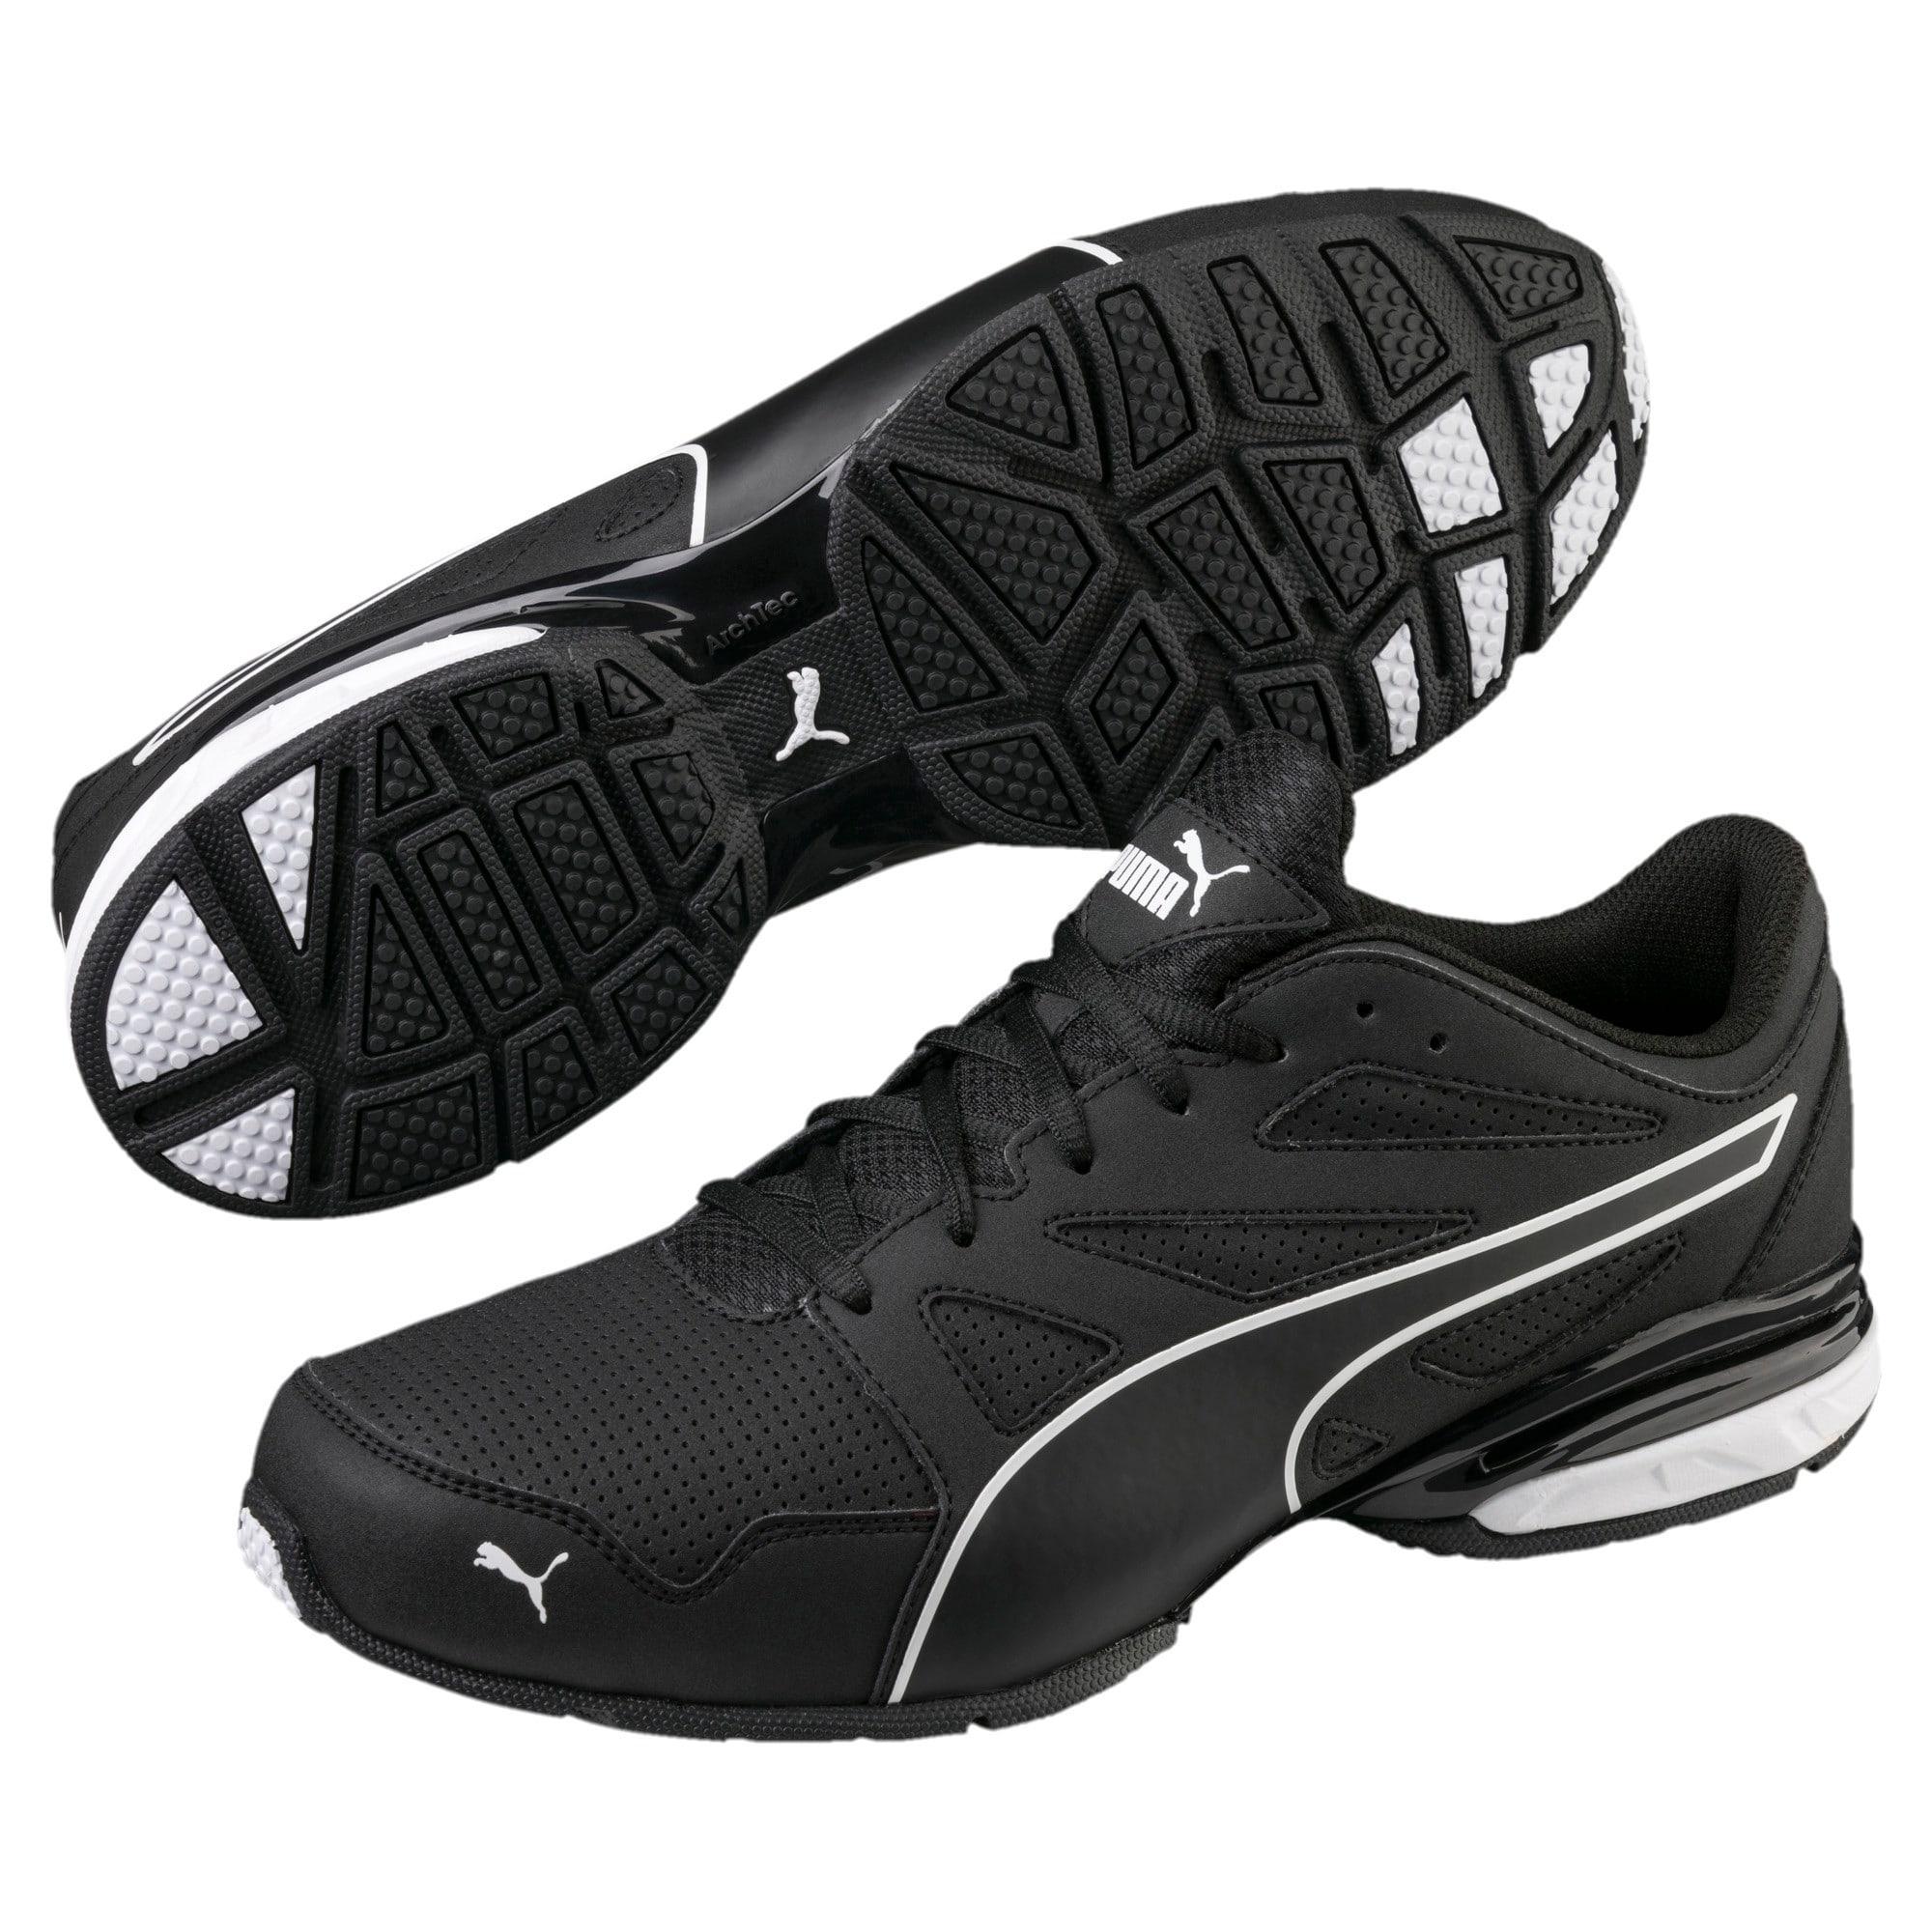 Thumbnail 6 of Tazon Modern SL Men's Running Shoes, Puma Black-Puma White, medium-IND